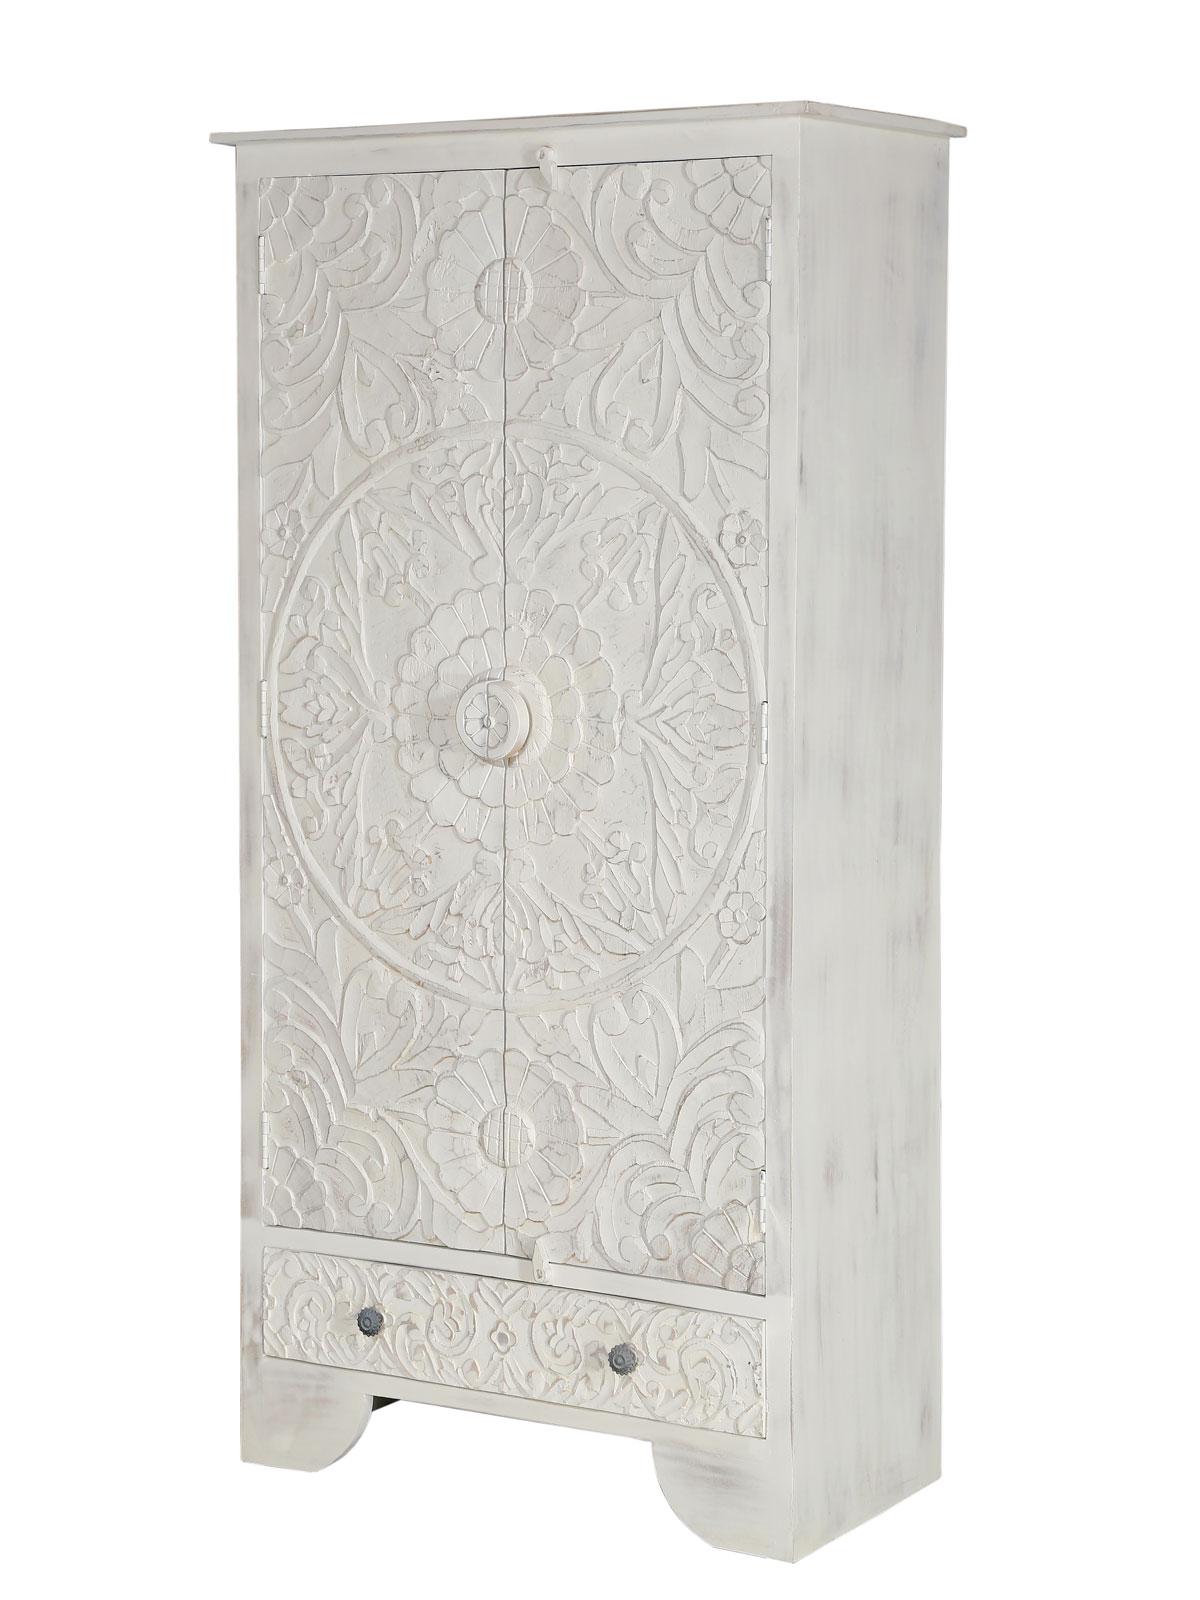 Kleiderschrank Weiß Mangoholz Massiv 90x180x45 Cm Handgeschnitzt